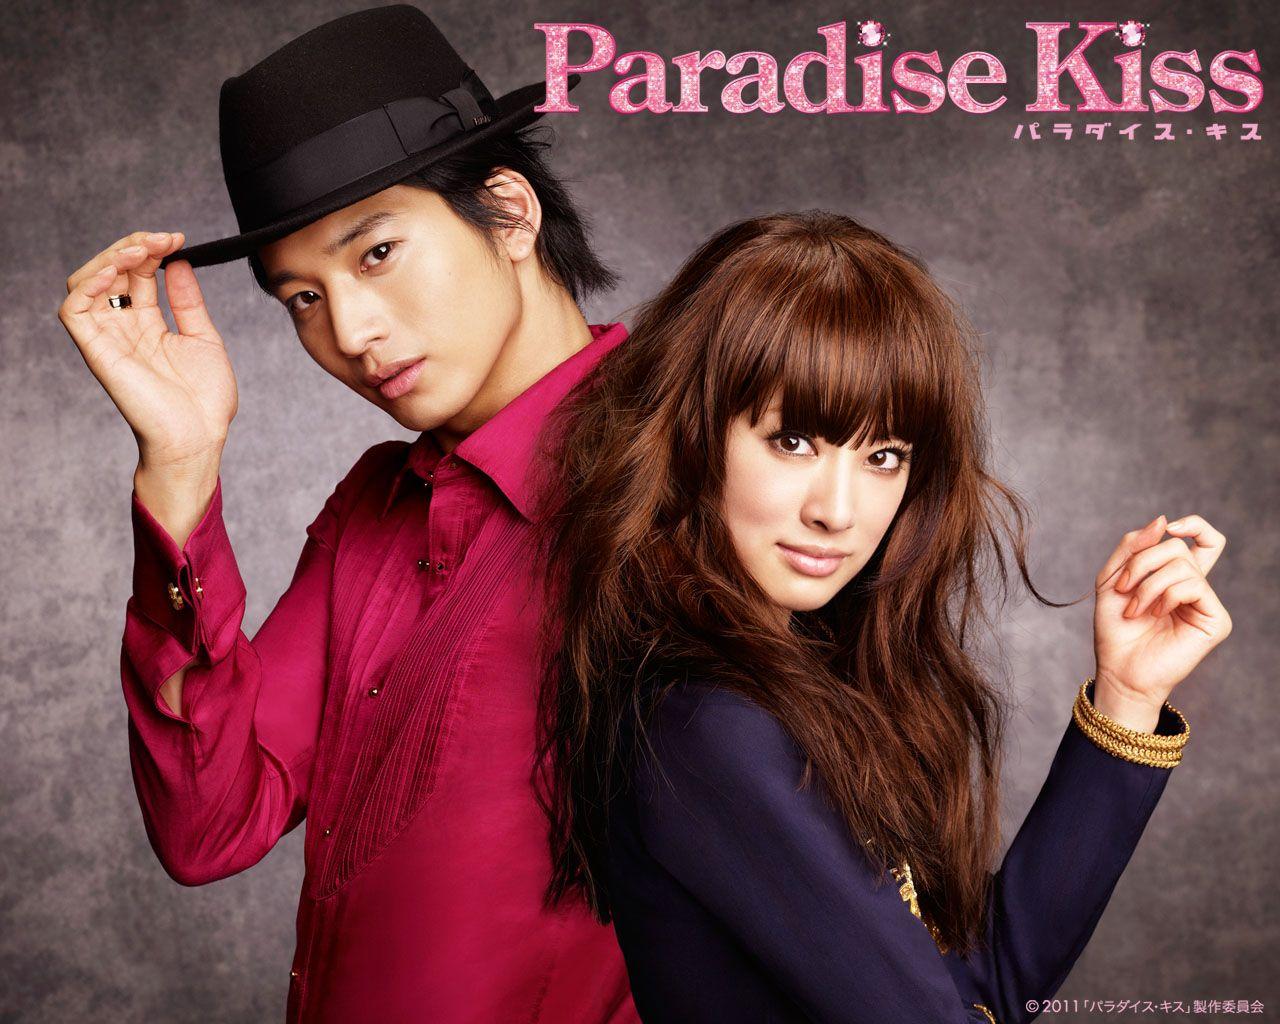 Paradise Kiss Http 2 Bp Blogspot Com Ijcjsu 6k0o Uuxqkozmgpi